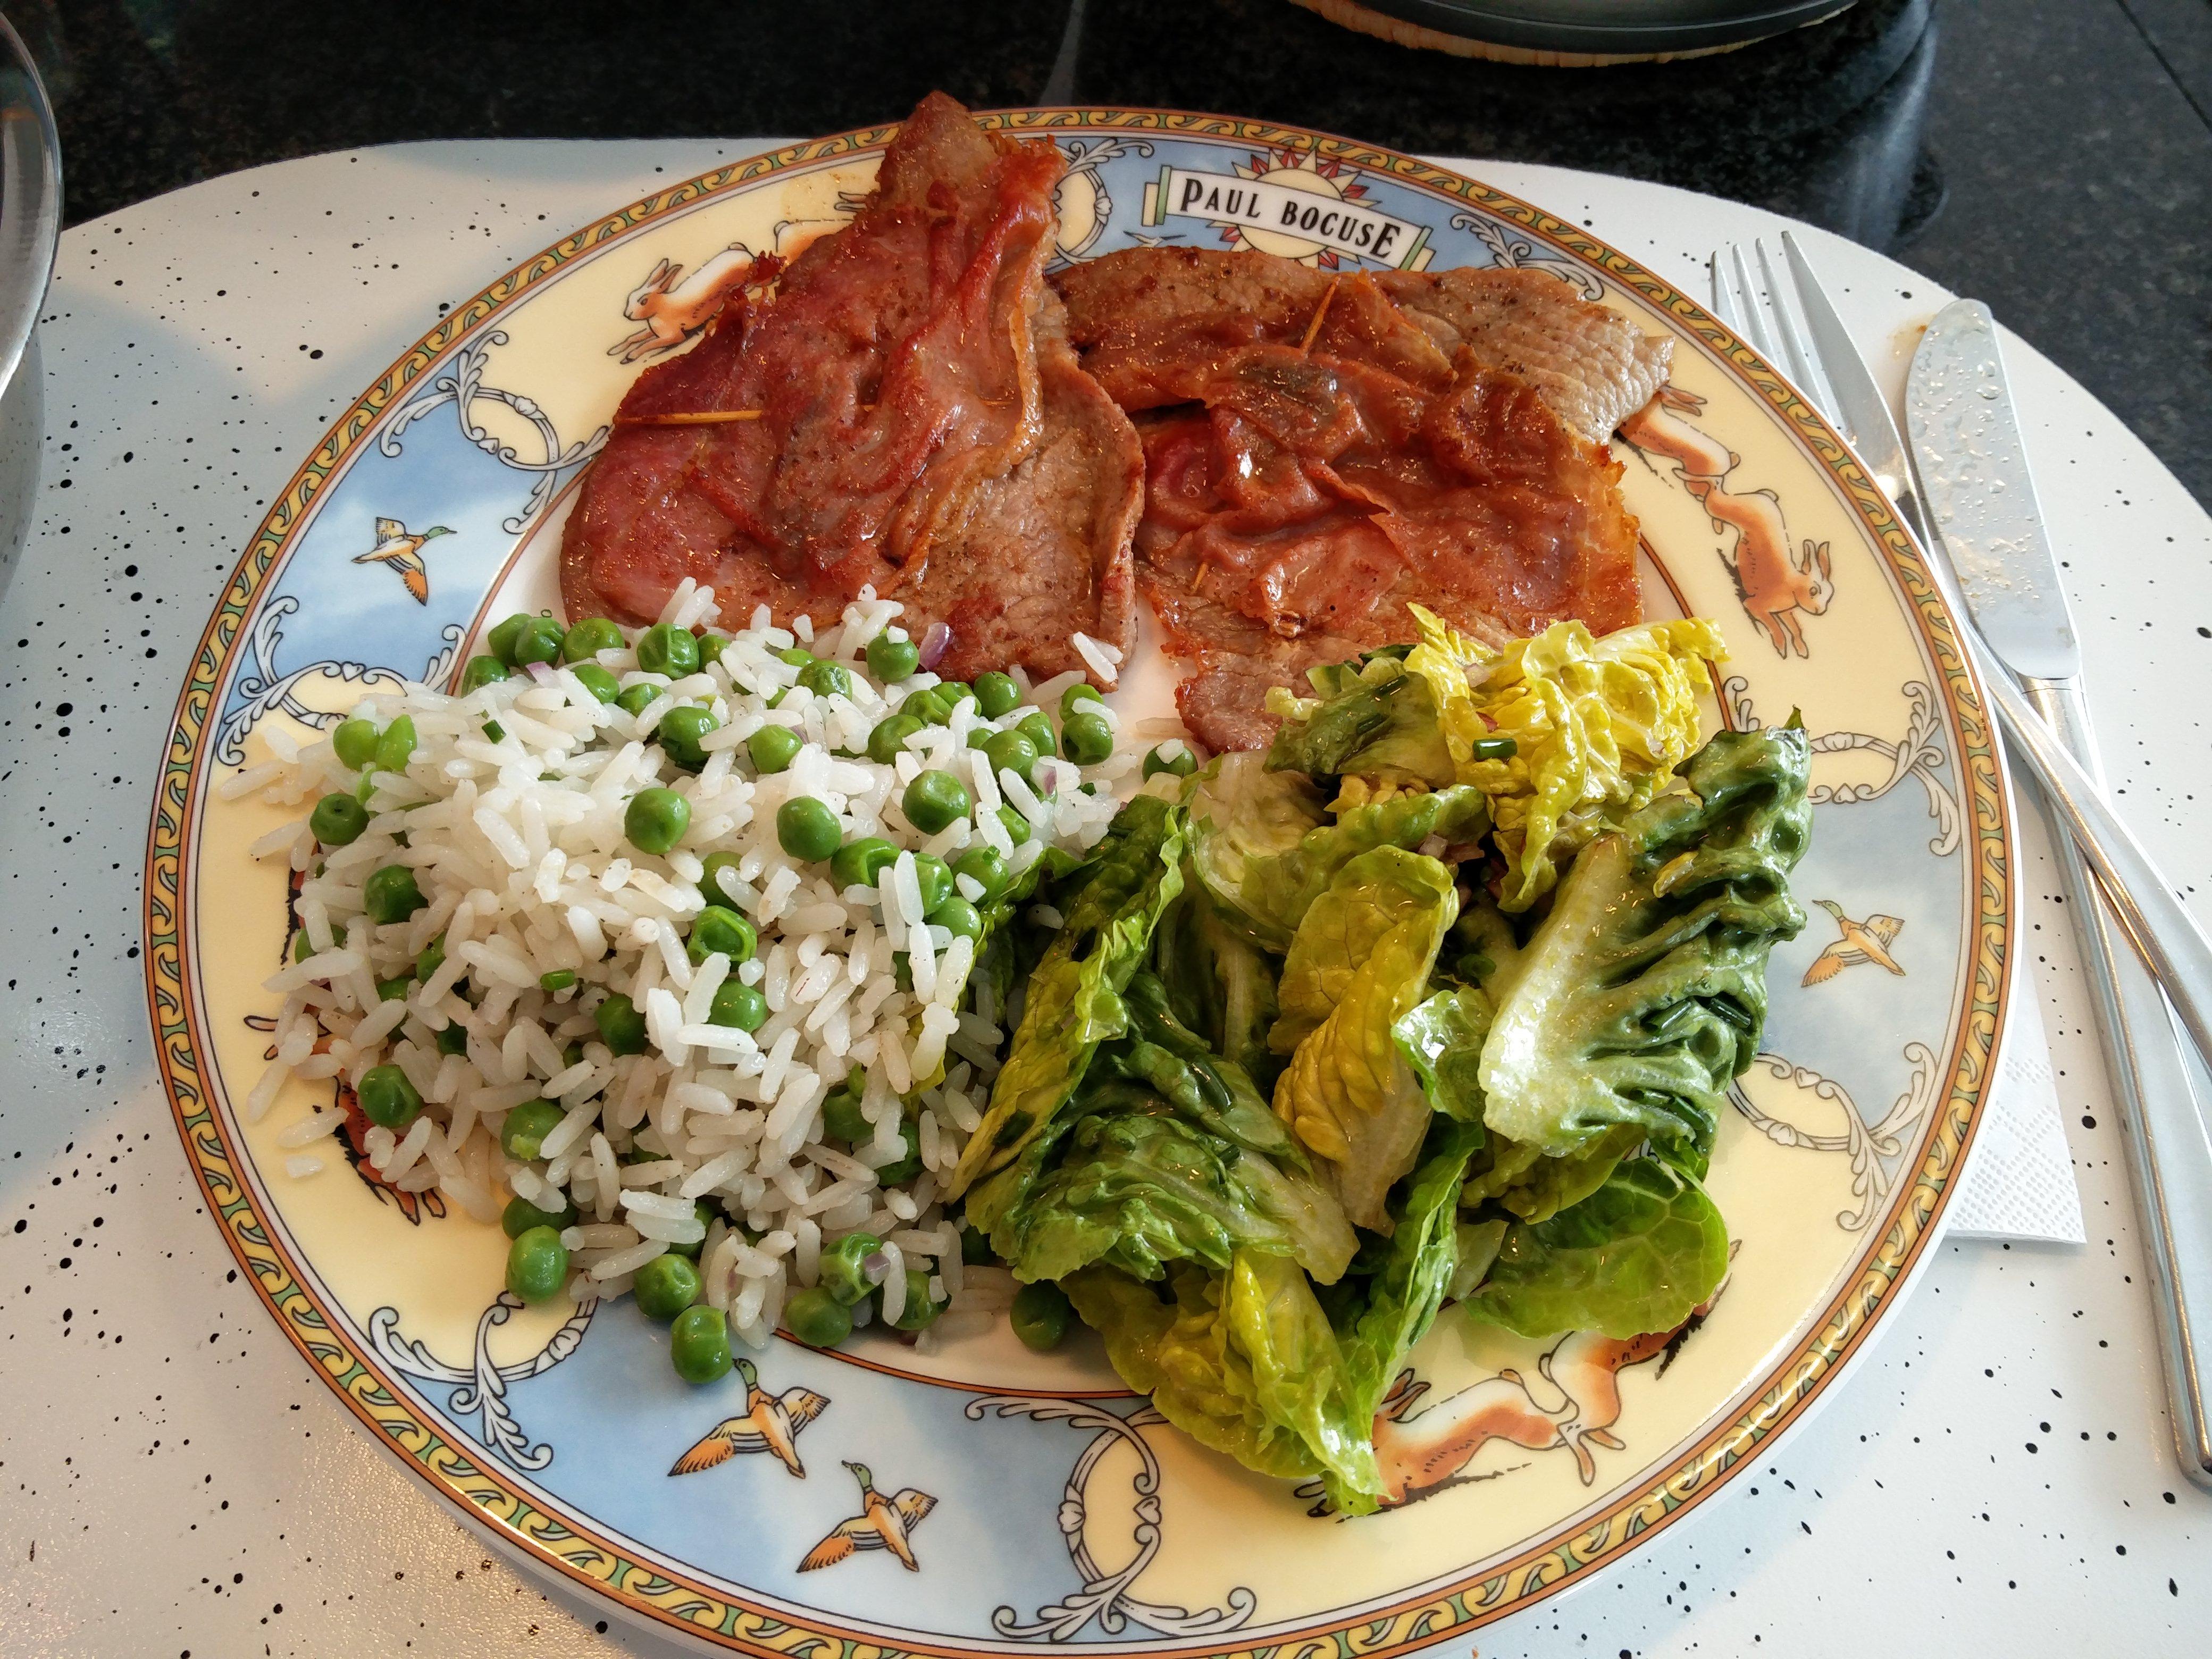 https://foodloader.net/nico_2016-04-10_saltimbocca-mit-reis-und-salat.jpg